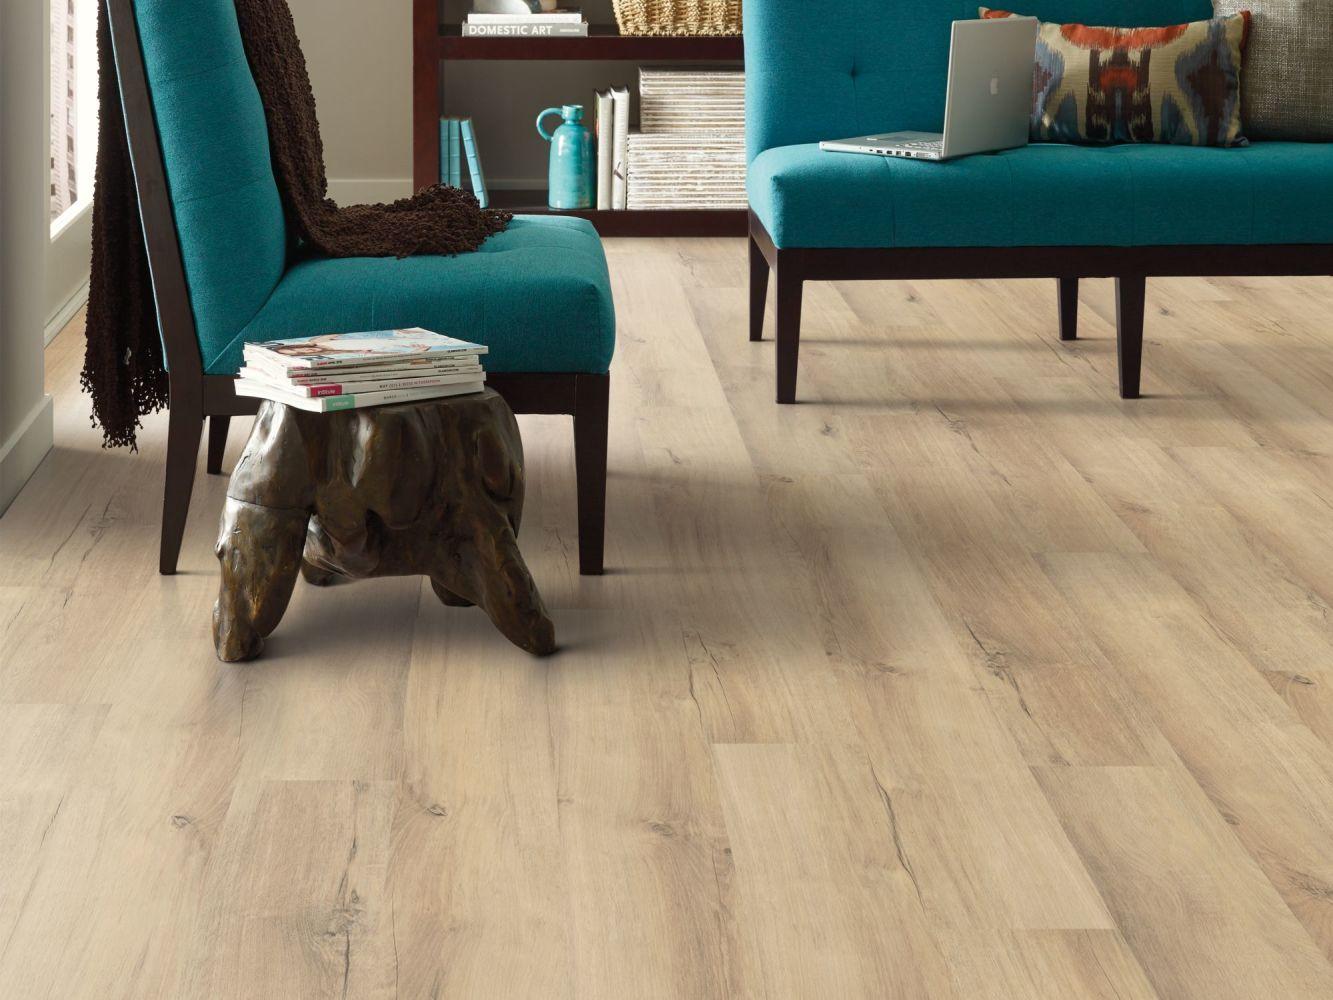 Shaw Floors Dr Horton Ballantyne Plus Click Marina 02014_DR036